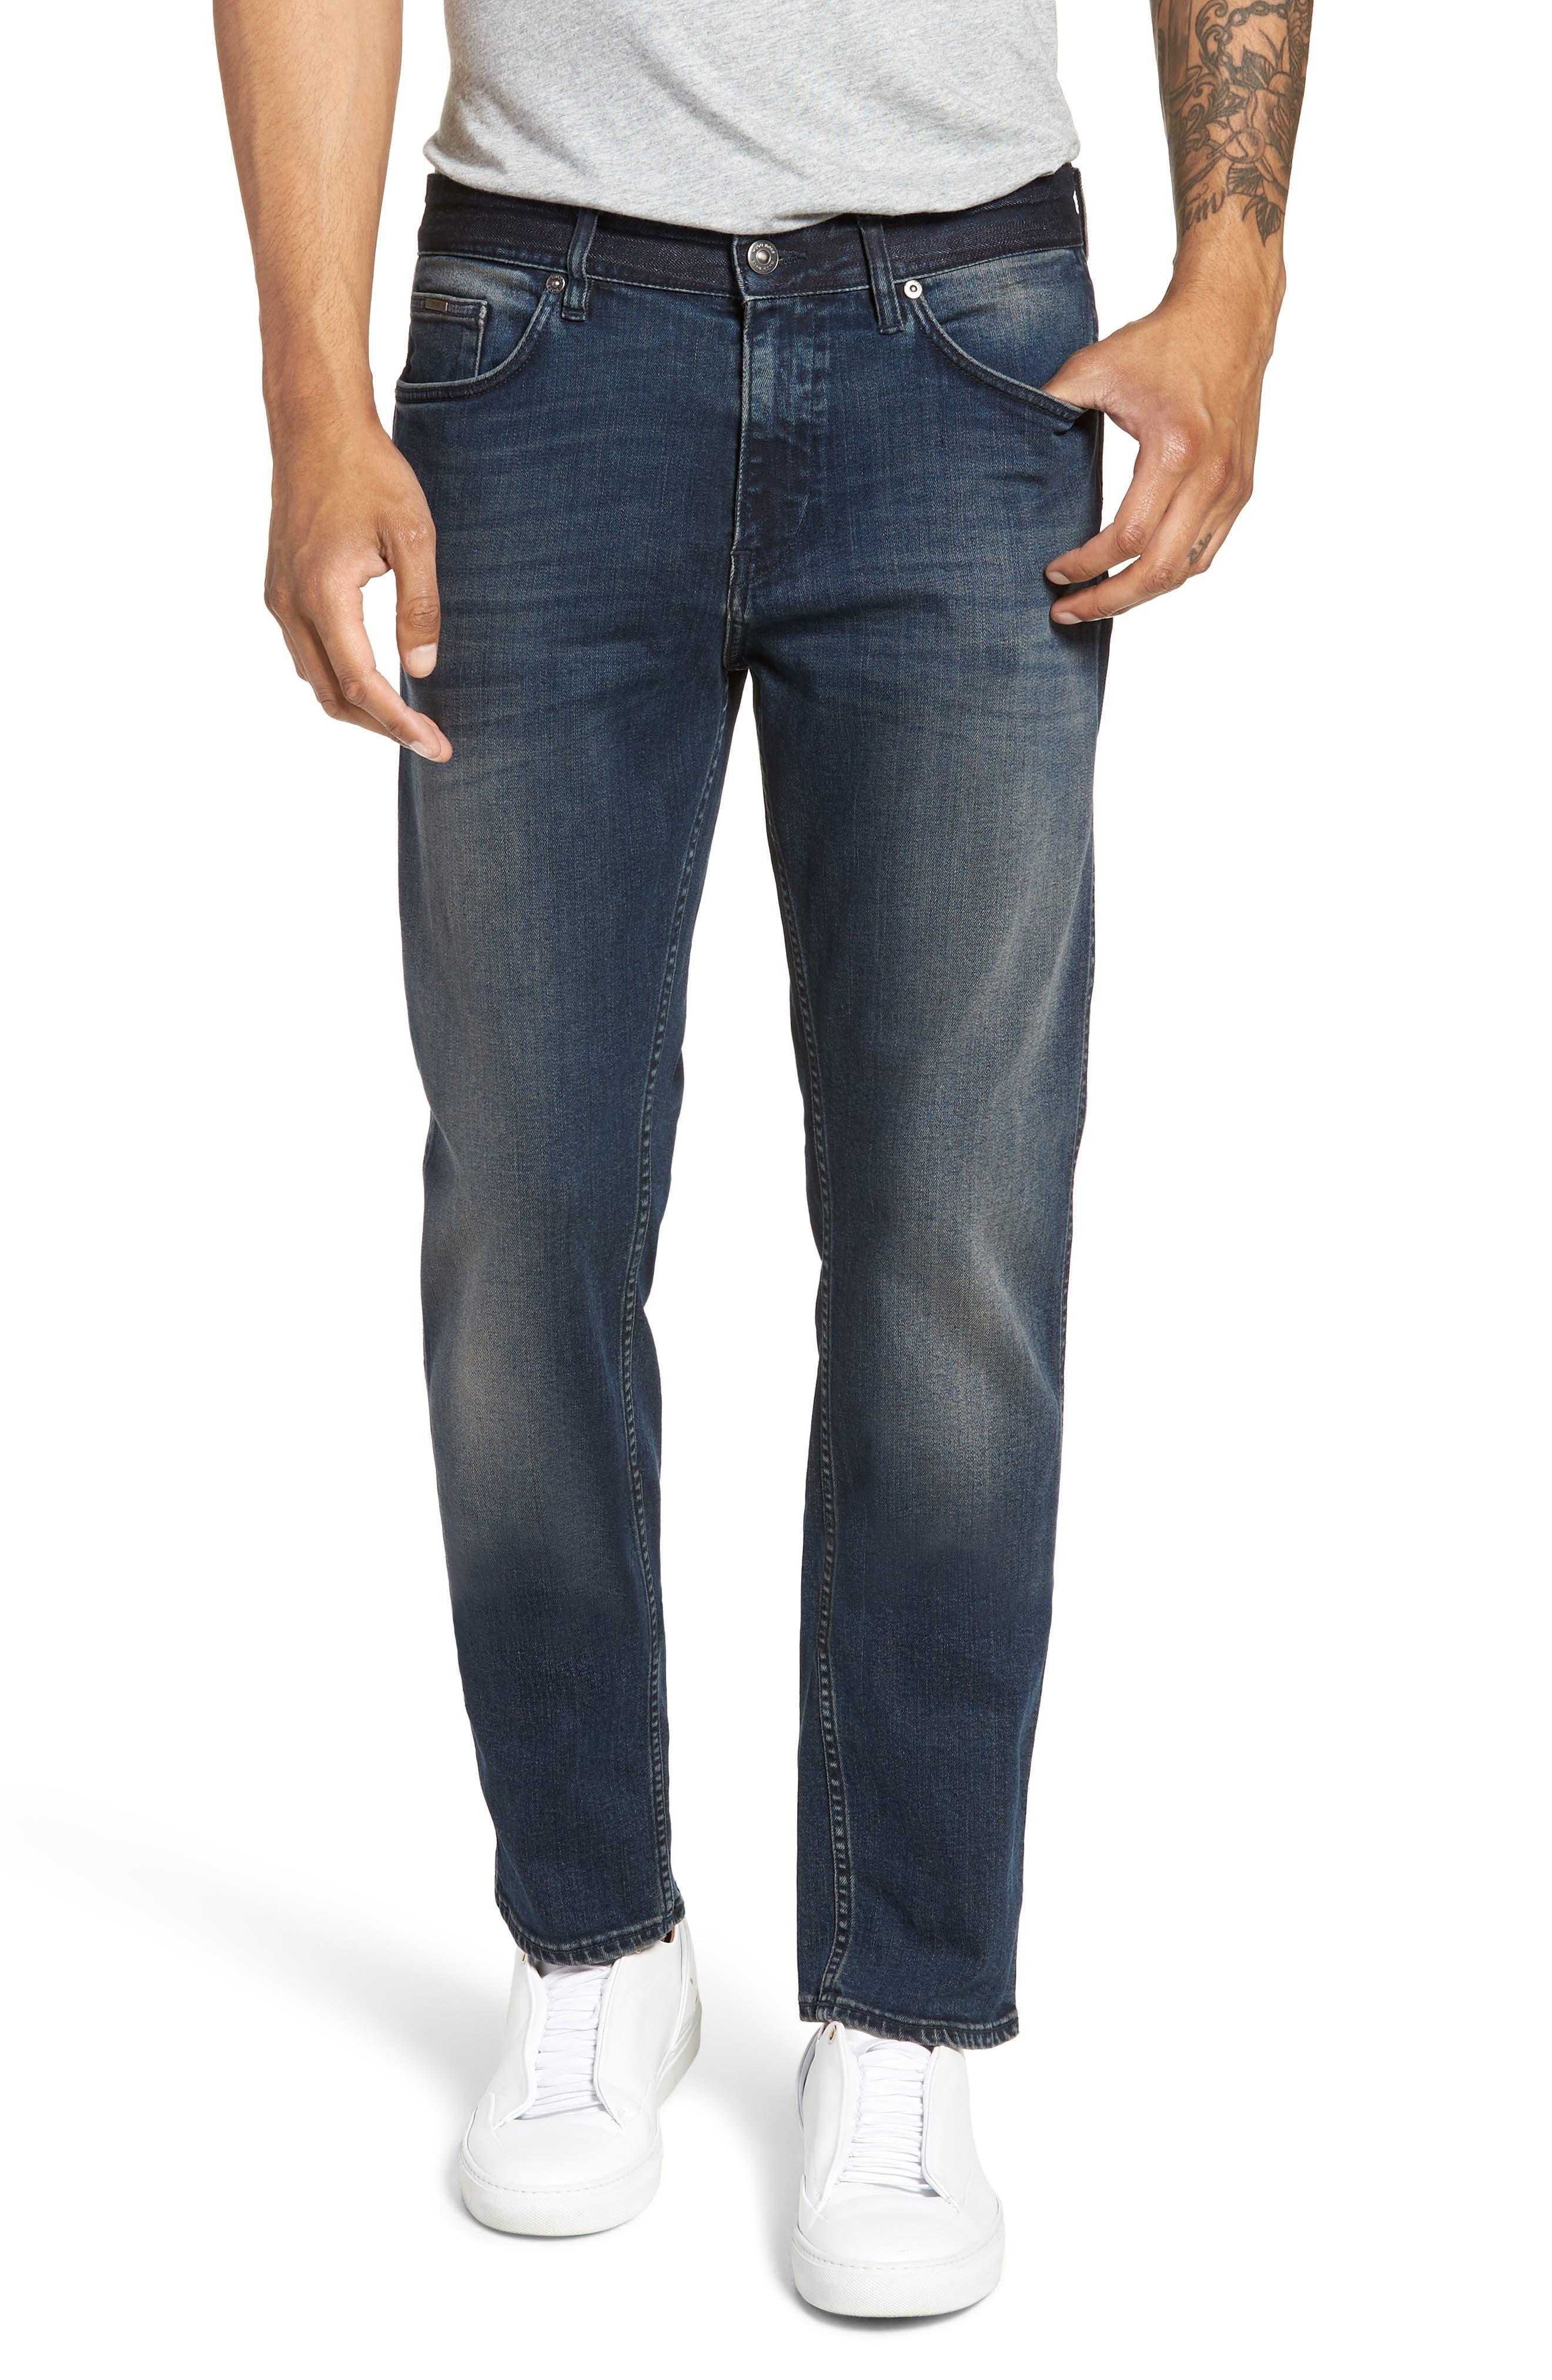 Delaware Slim Fit Jeans,                             Main thumbnail 1, color,                             418